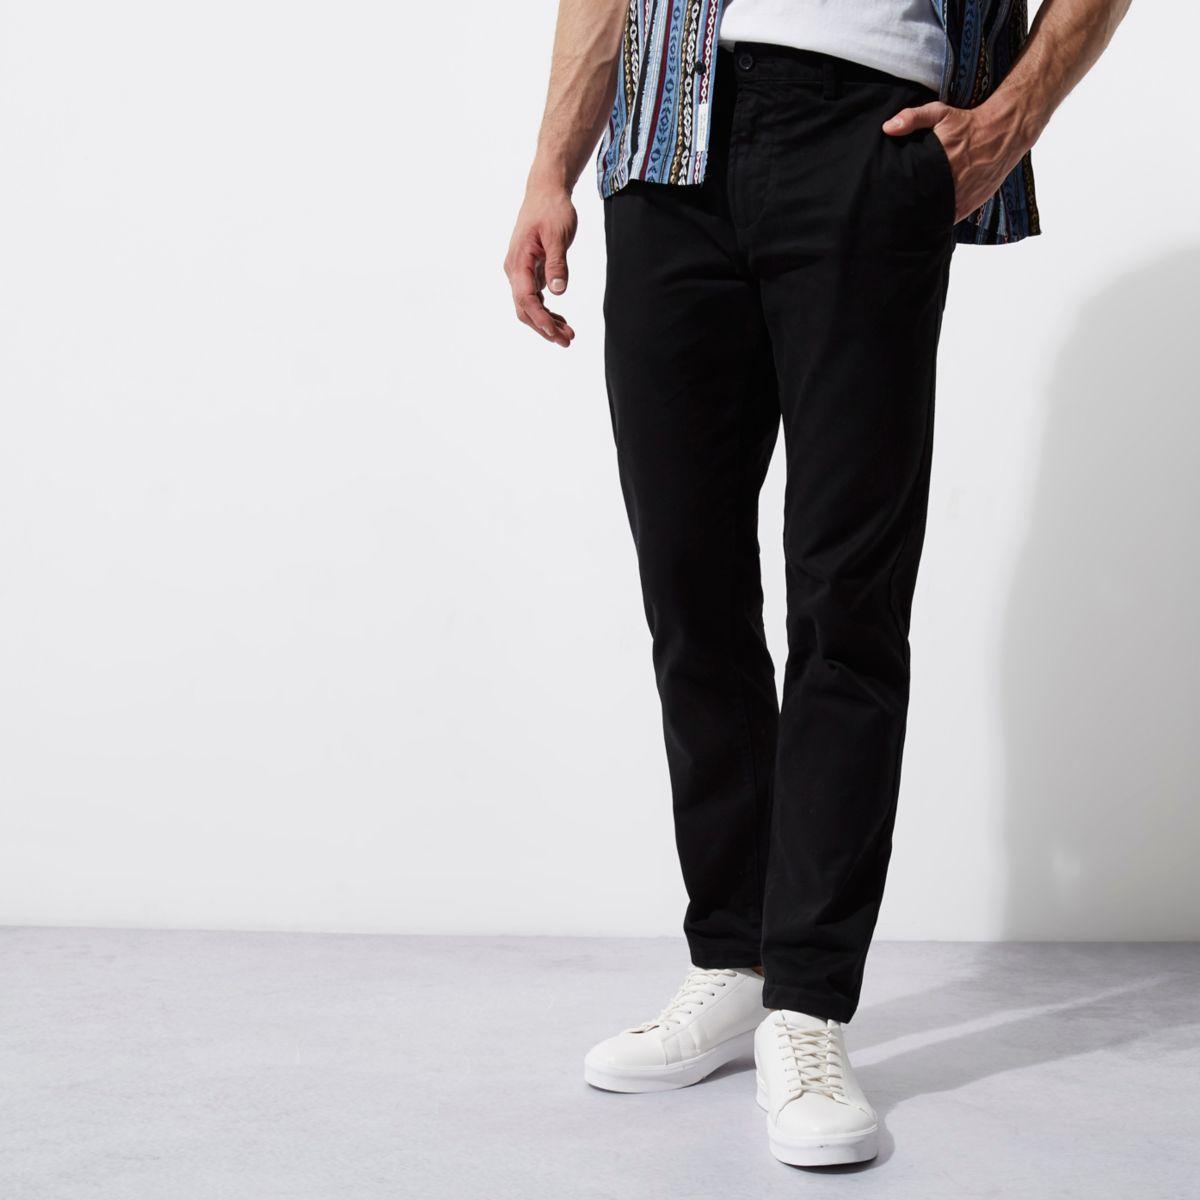 Black casual slim fit chino pants